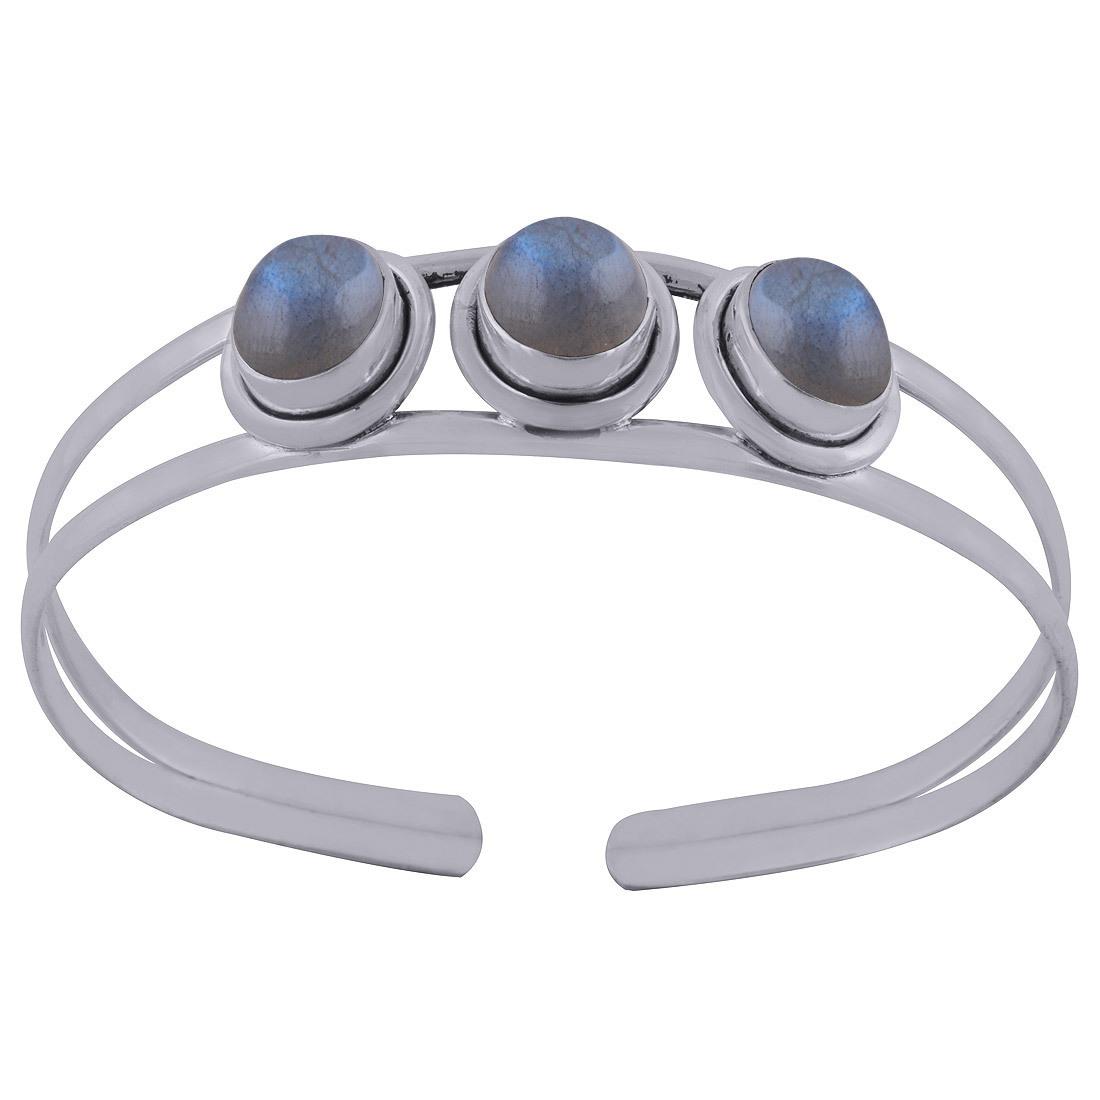 Black Onyx Natural Gemstone Oval 925 Sterling Solid Silver Handmade Bangle